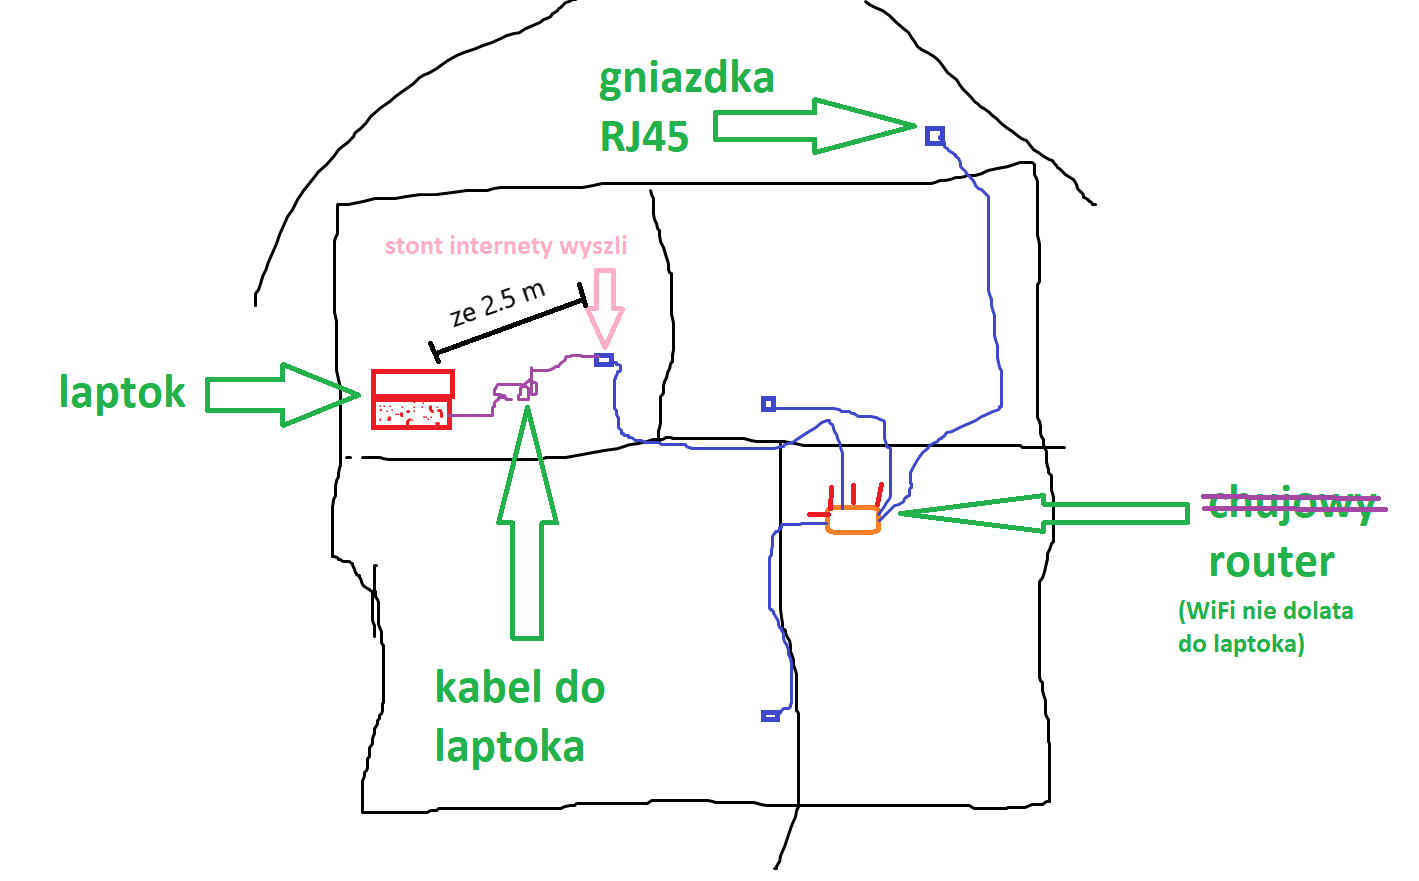 schemat_v_2.0.png